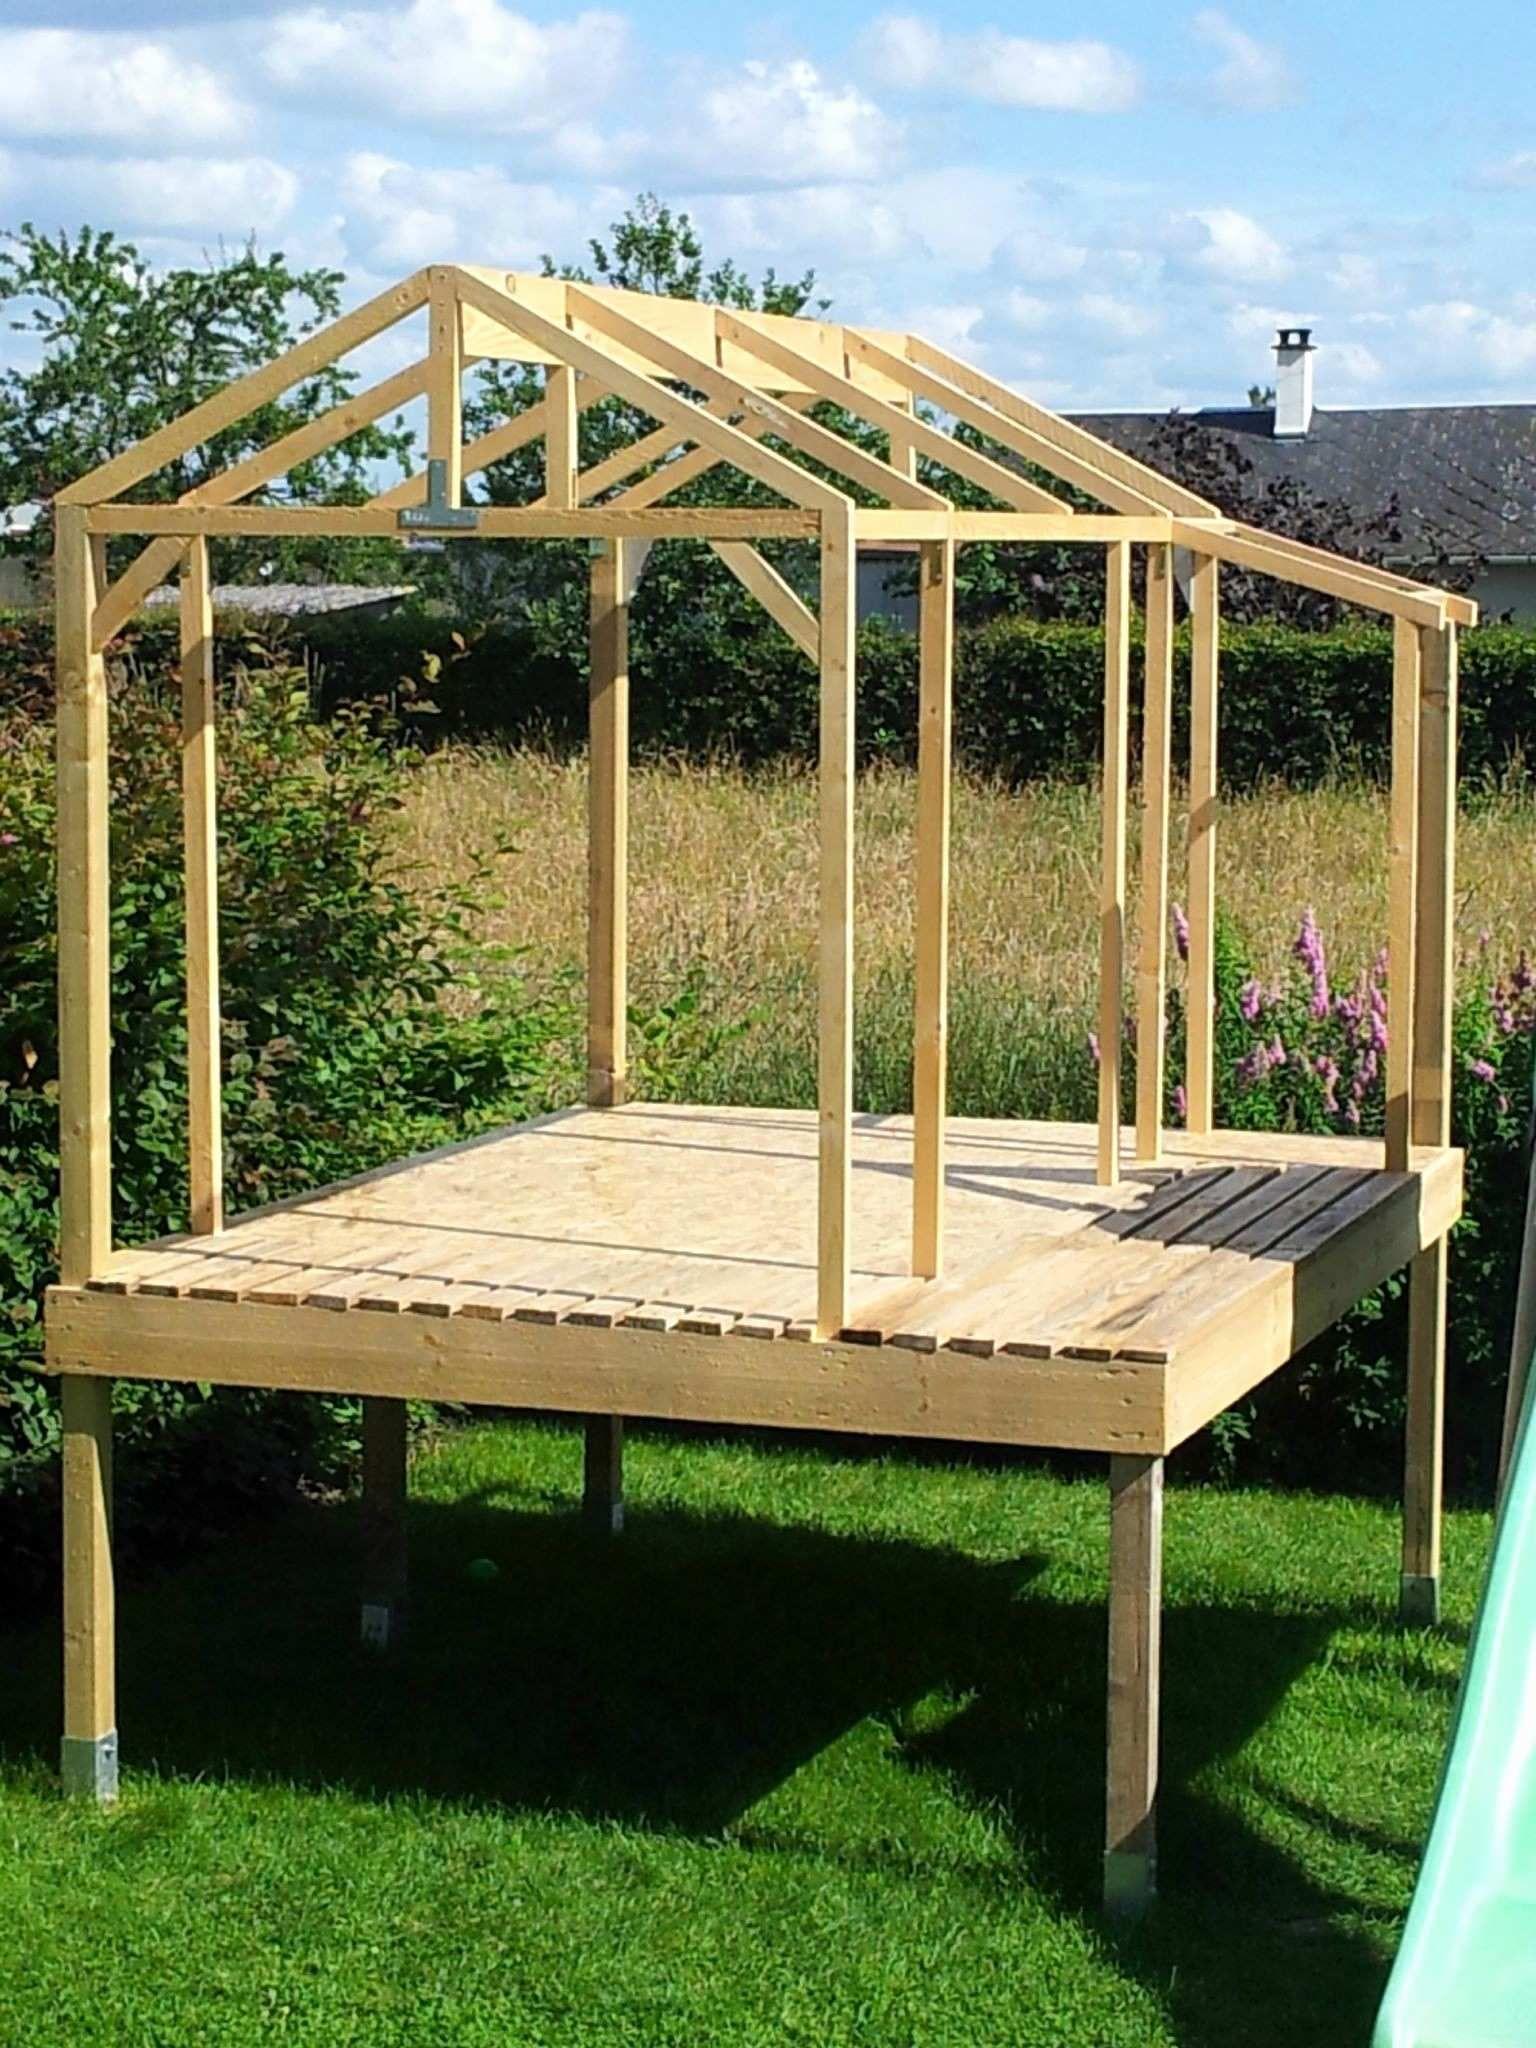 Fabriquer Abri De Jardin En Bois Construire Abri   Своими ... à Construire Cabane De Jardin